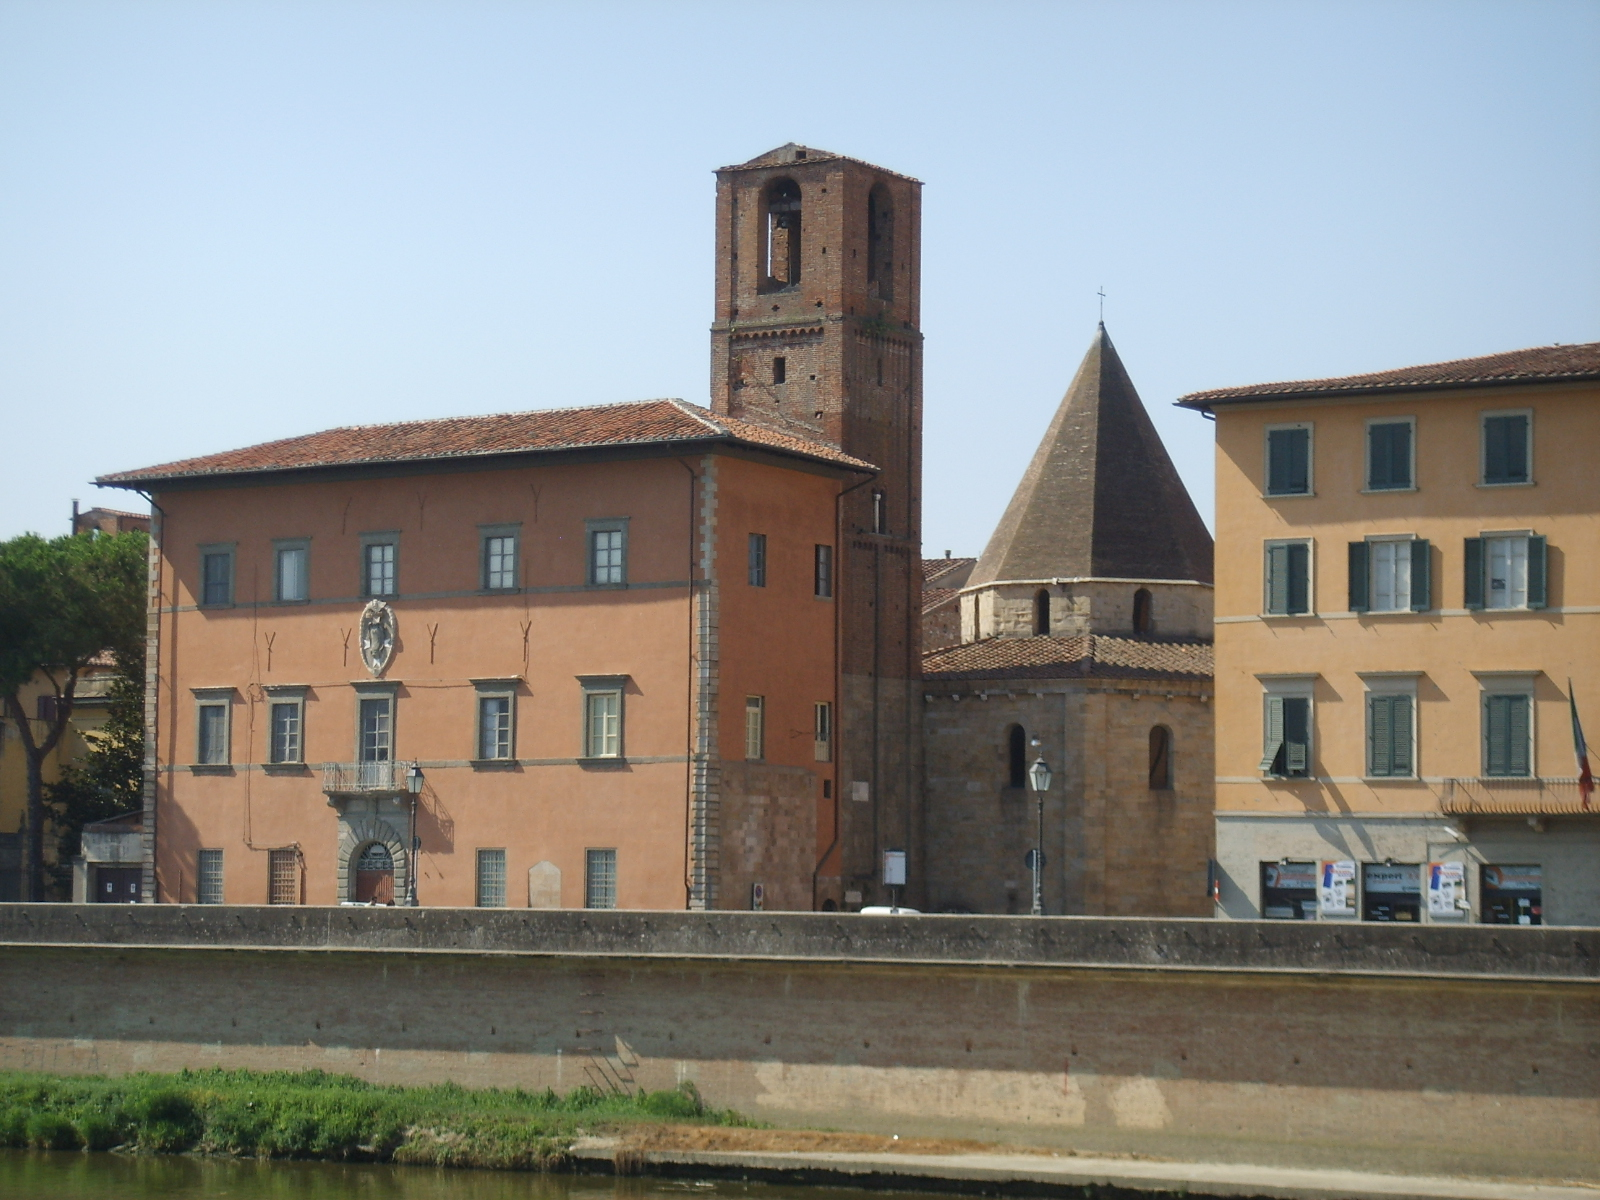 Dagobert of Pisa